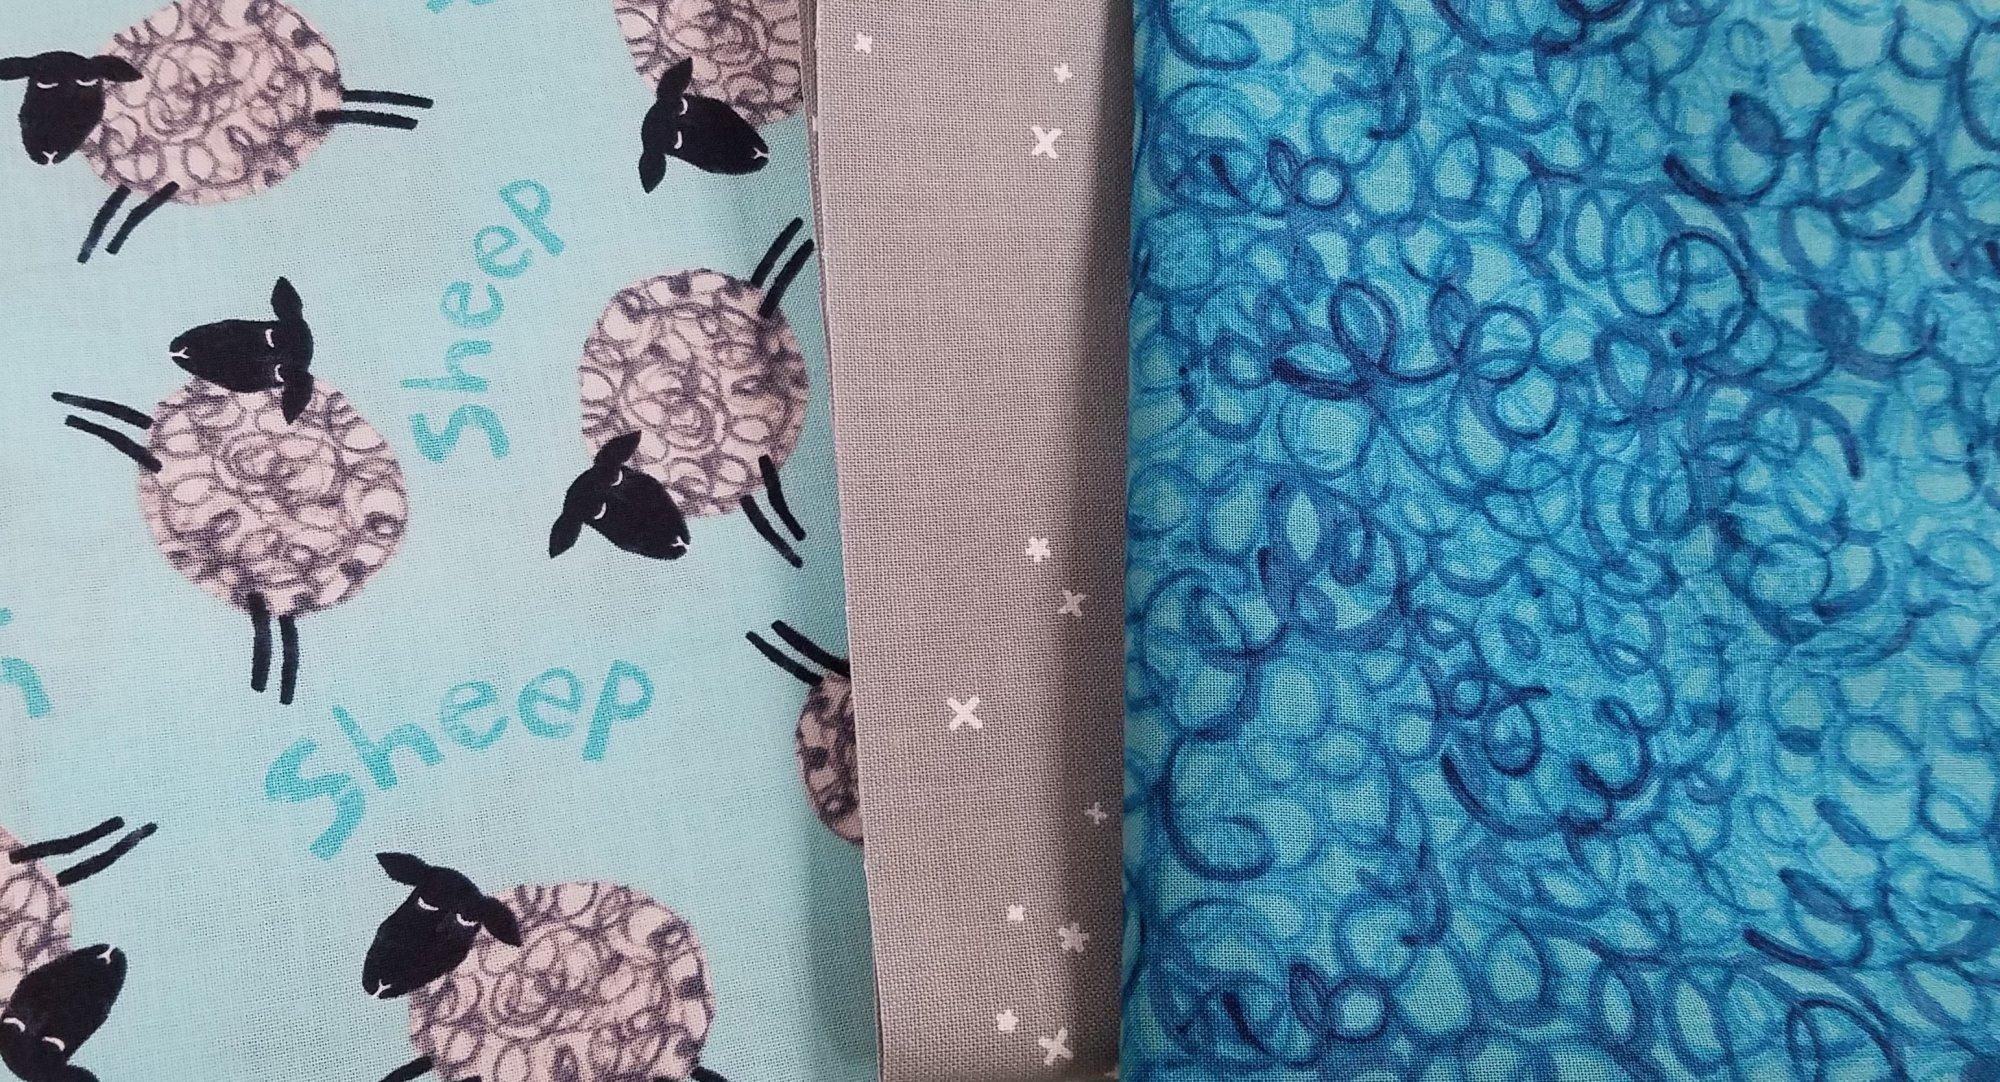 Animal Magic Blue Sheep Pillowcase Kit